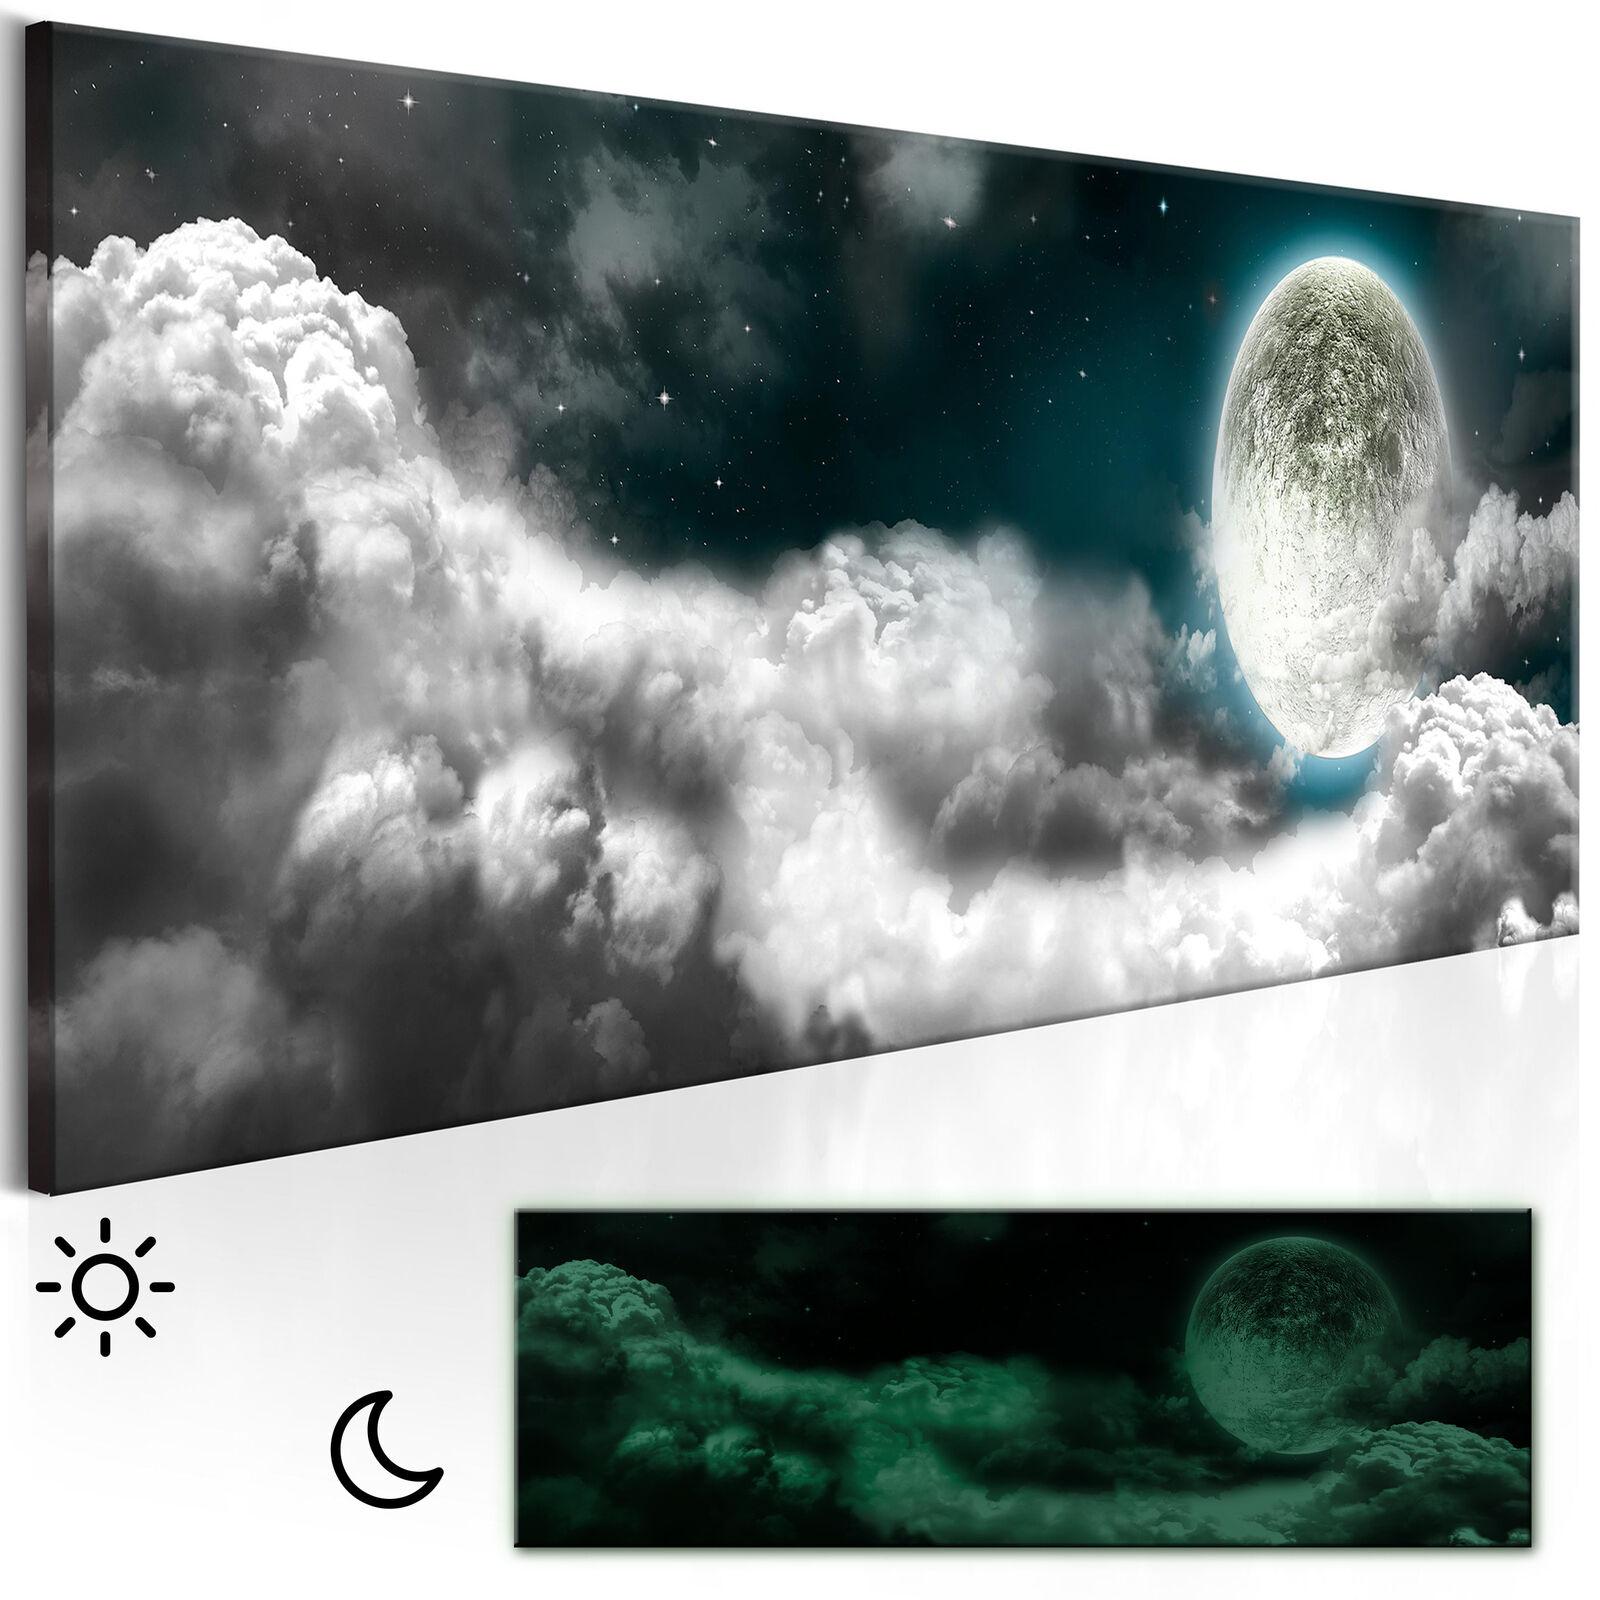 LEINWAND BILDER Mond Natur Himmel Wolke WANDBILDER XXL Wohnzimmer Nachtleuchtend